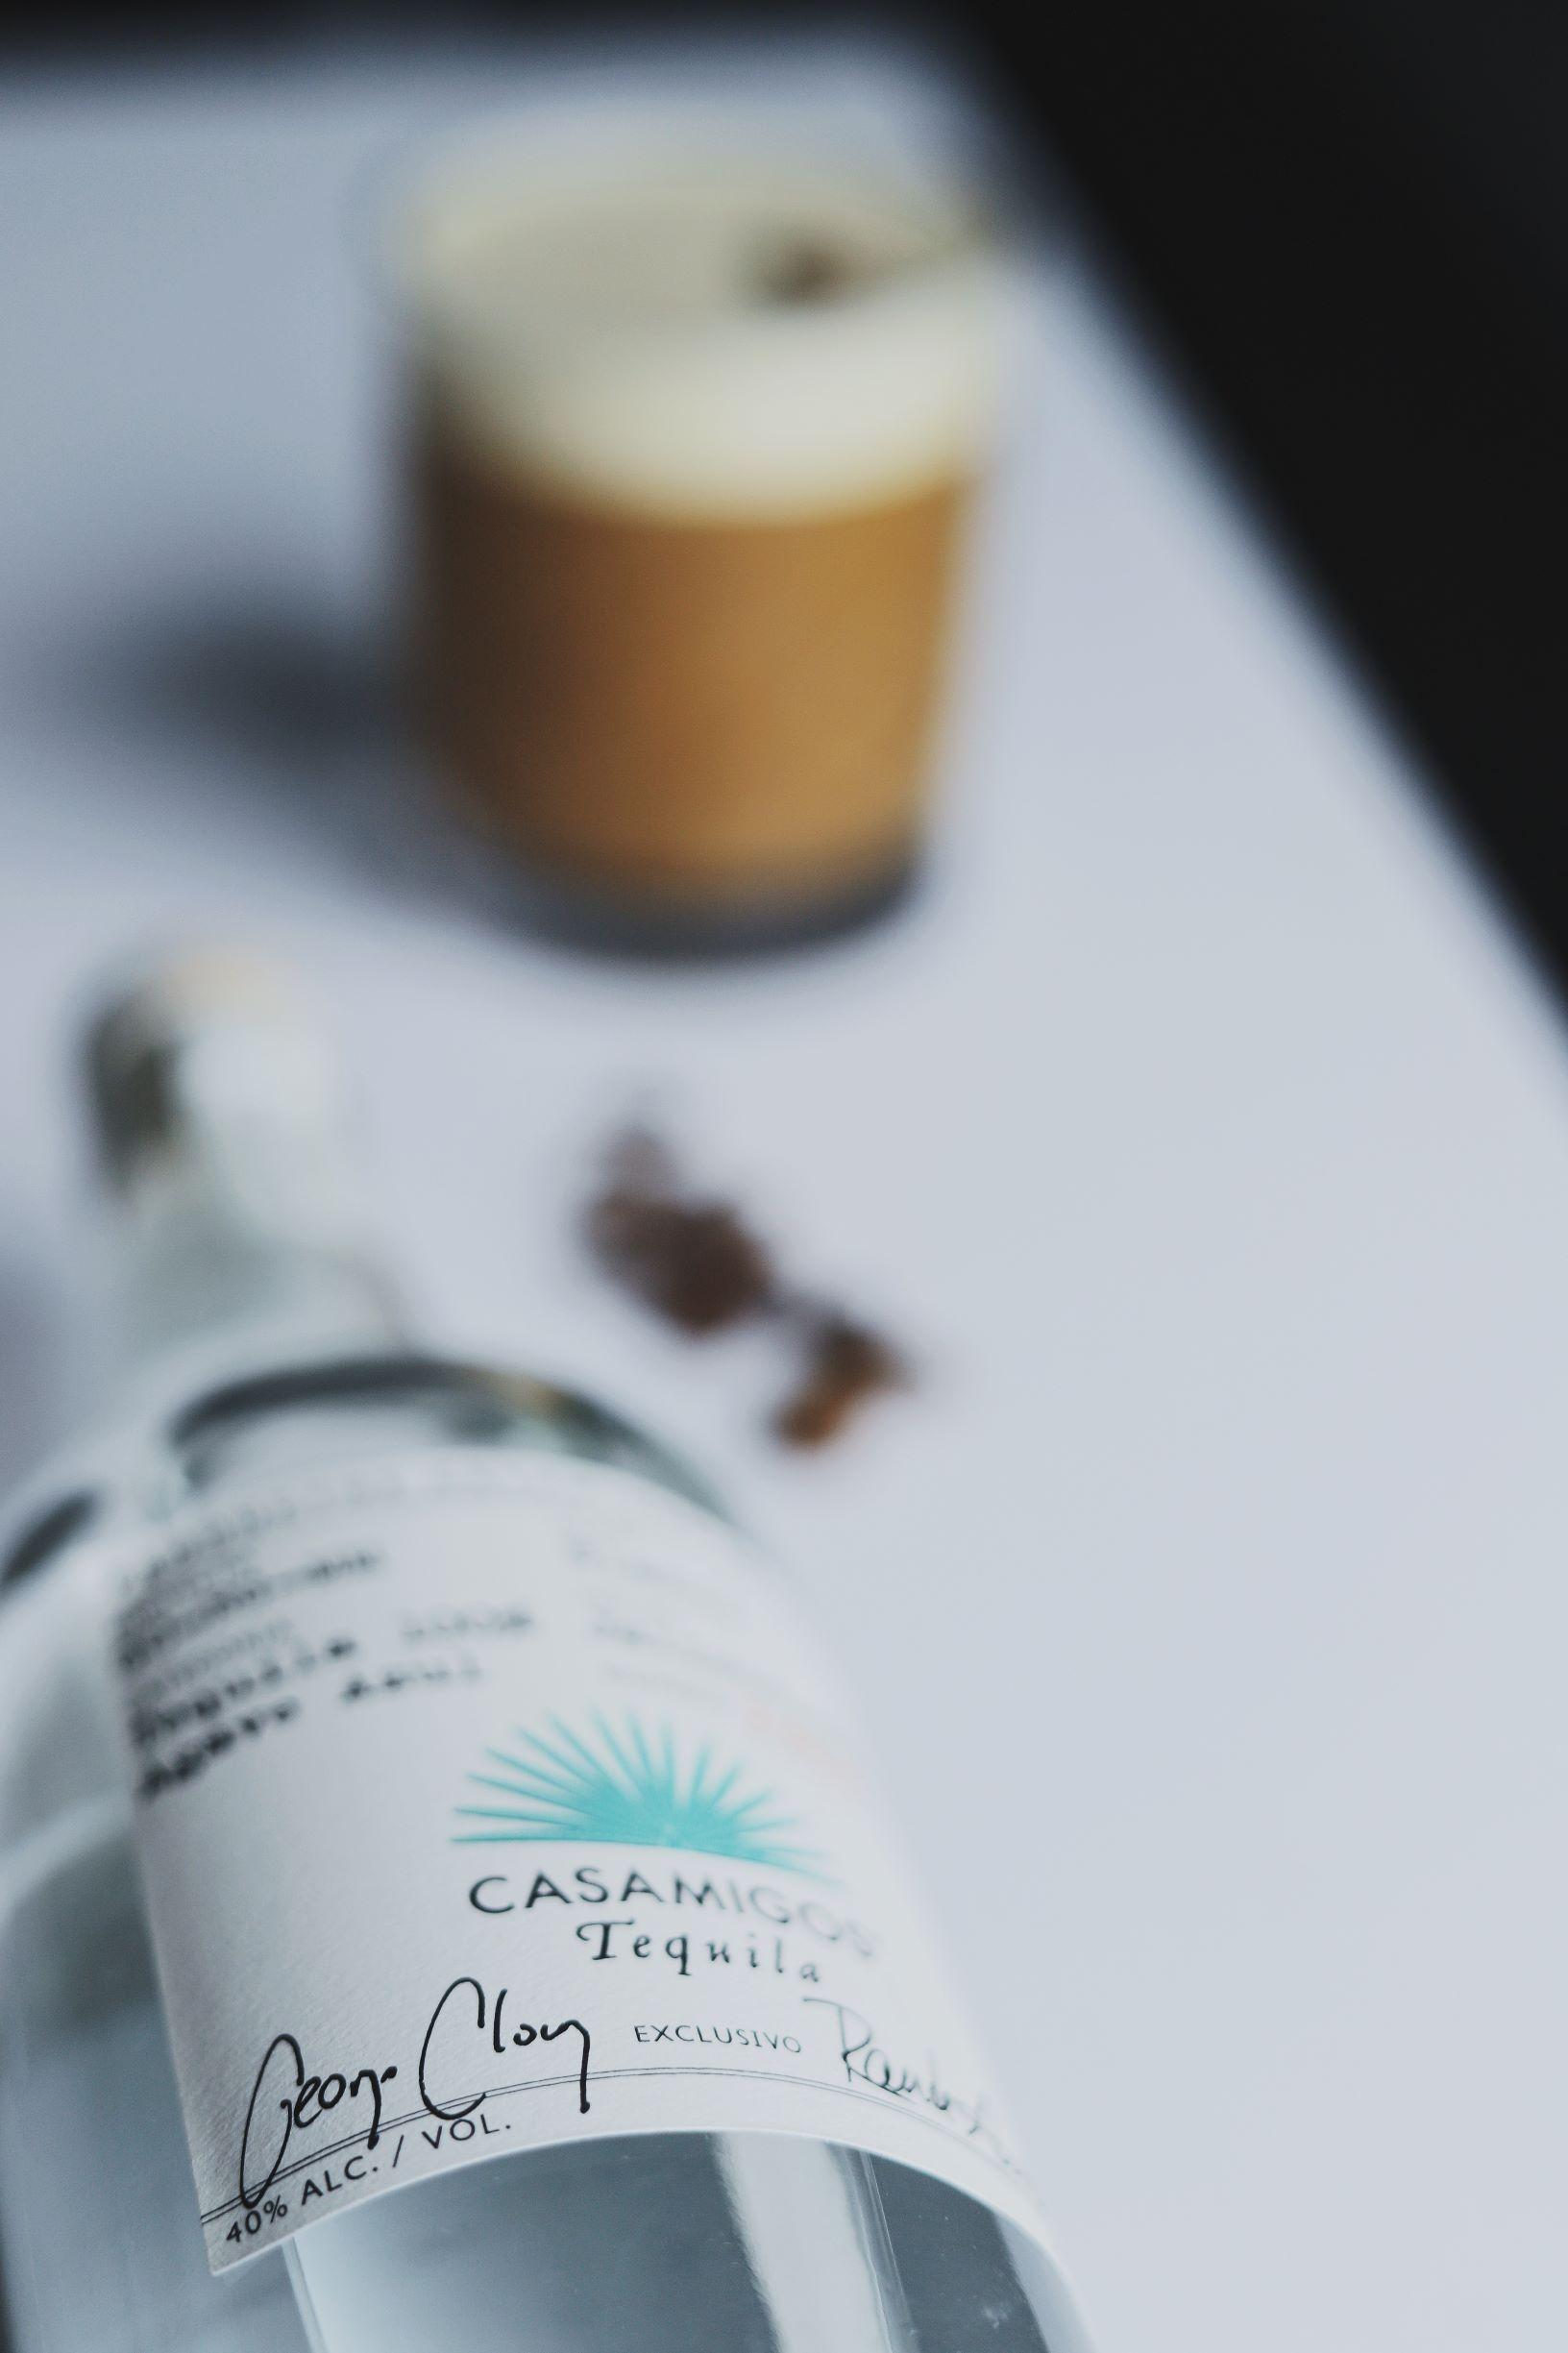 LeClair Organics Liberica Coffee, Casamigos Tequila Coffee Cocktail Recipe